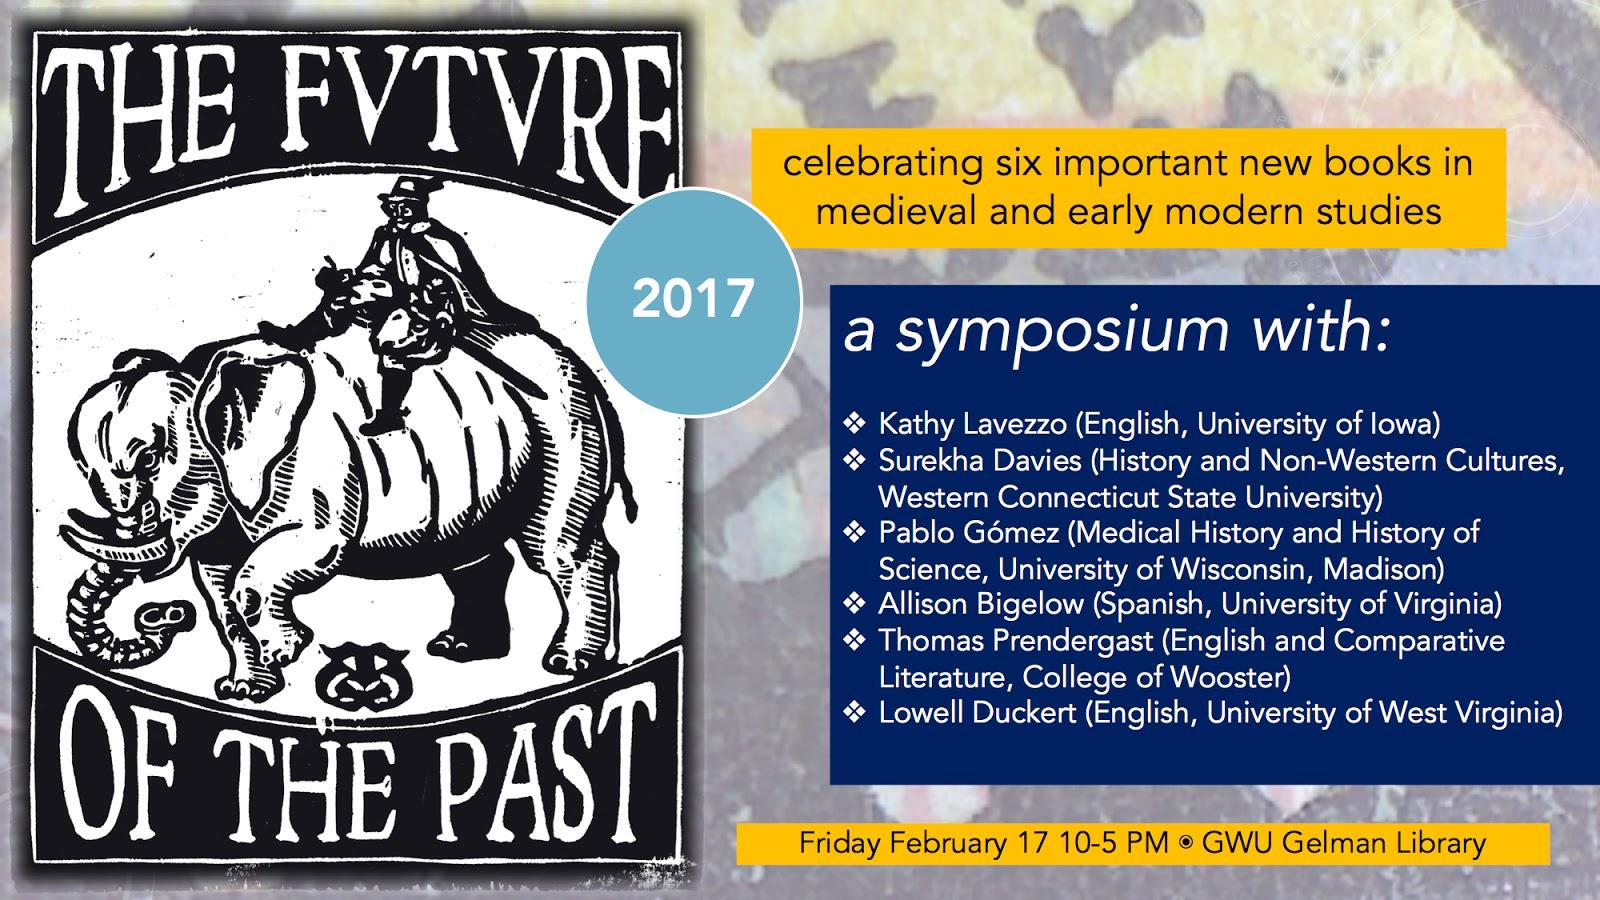 Wcsu Academic Calendar.Gw Memsi Futures Of The Past 2017 February 17